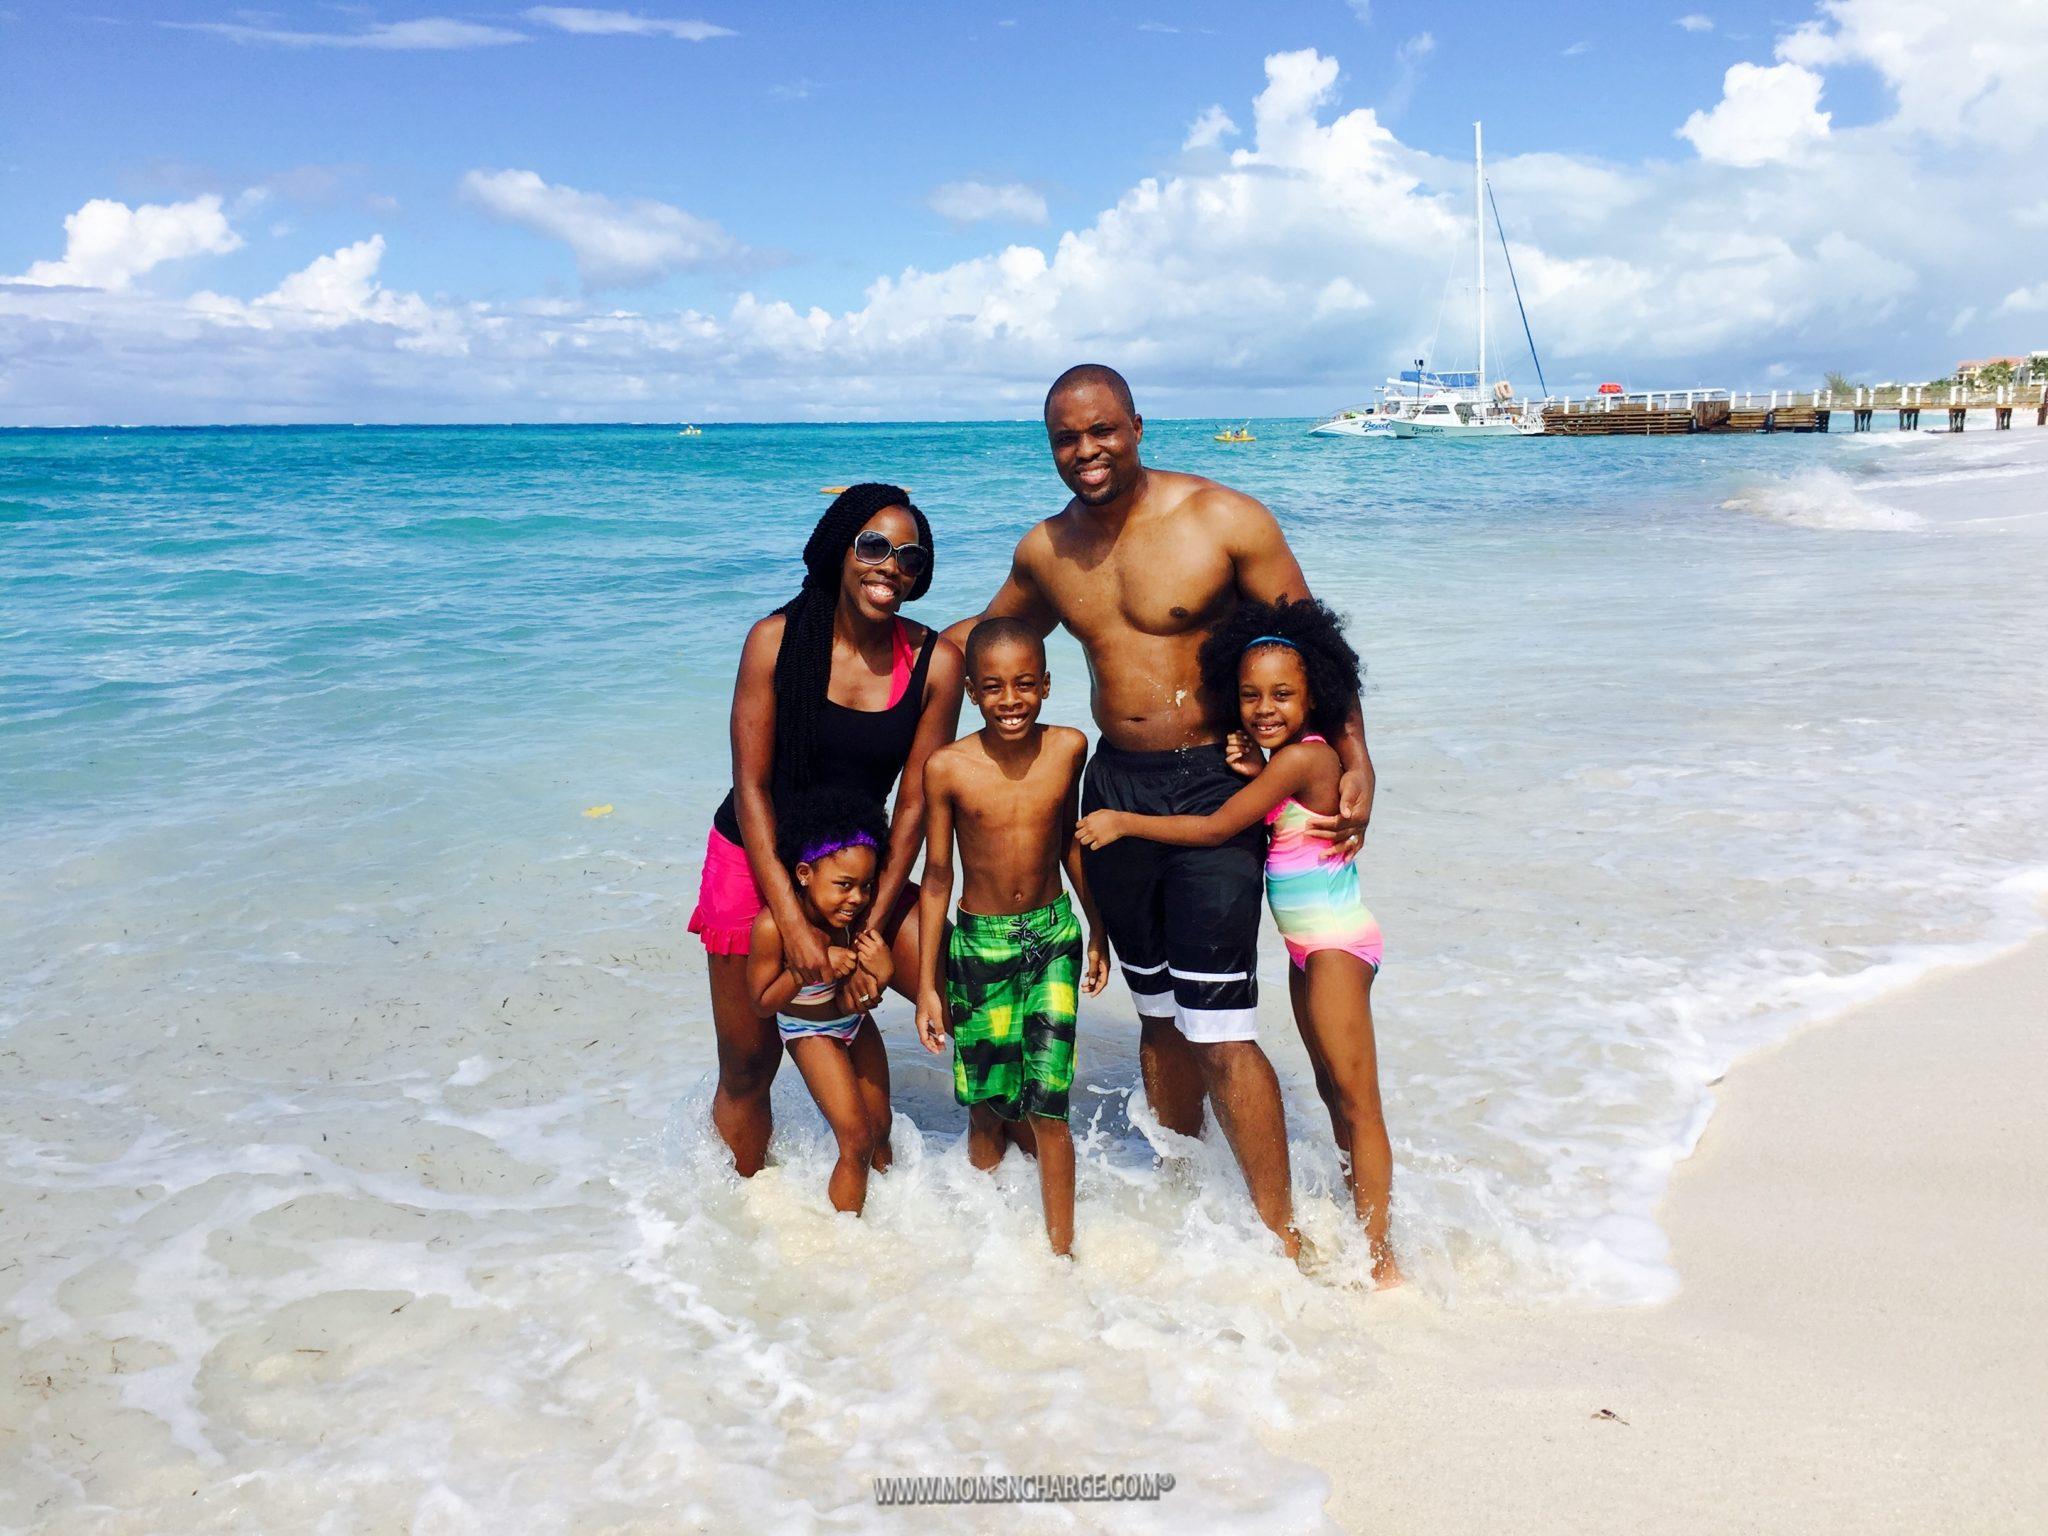 Turks And Caicos Beaches Resort  Dance